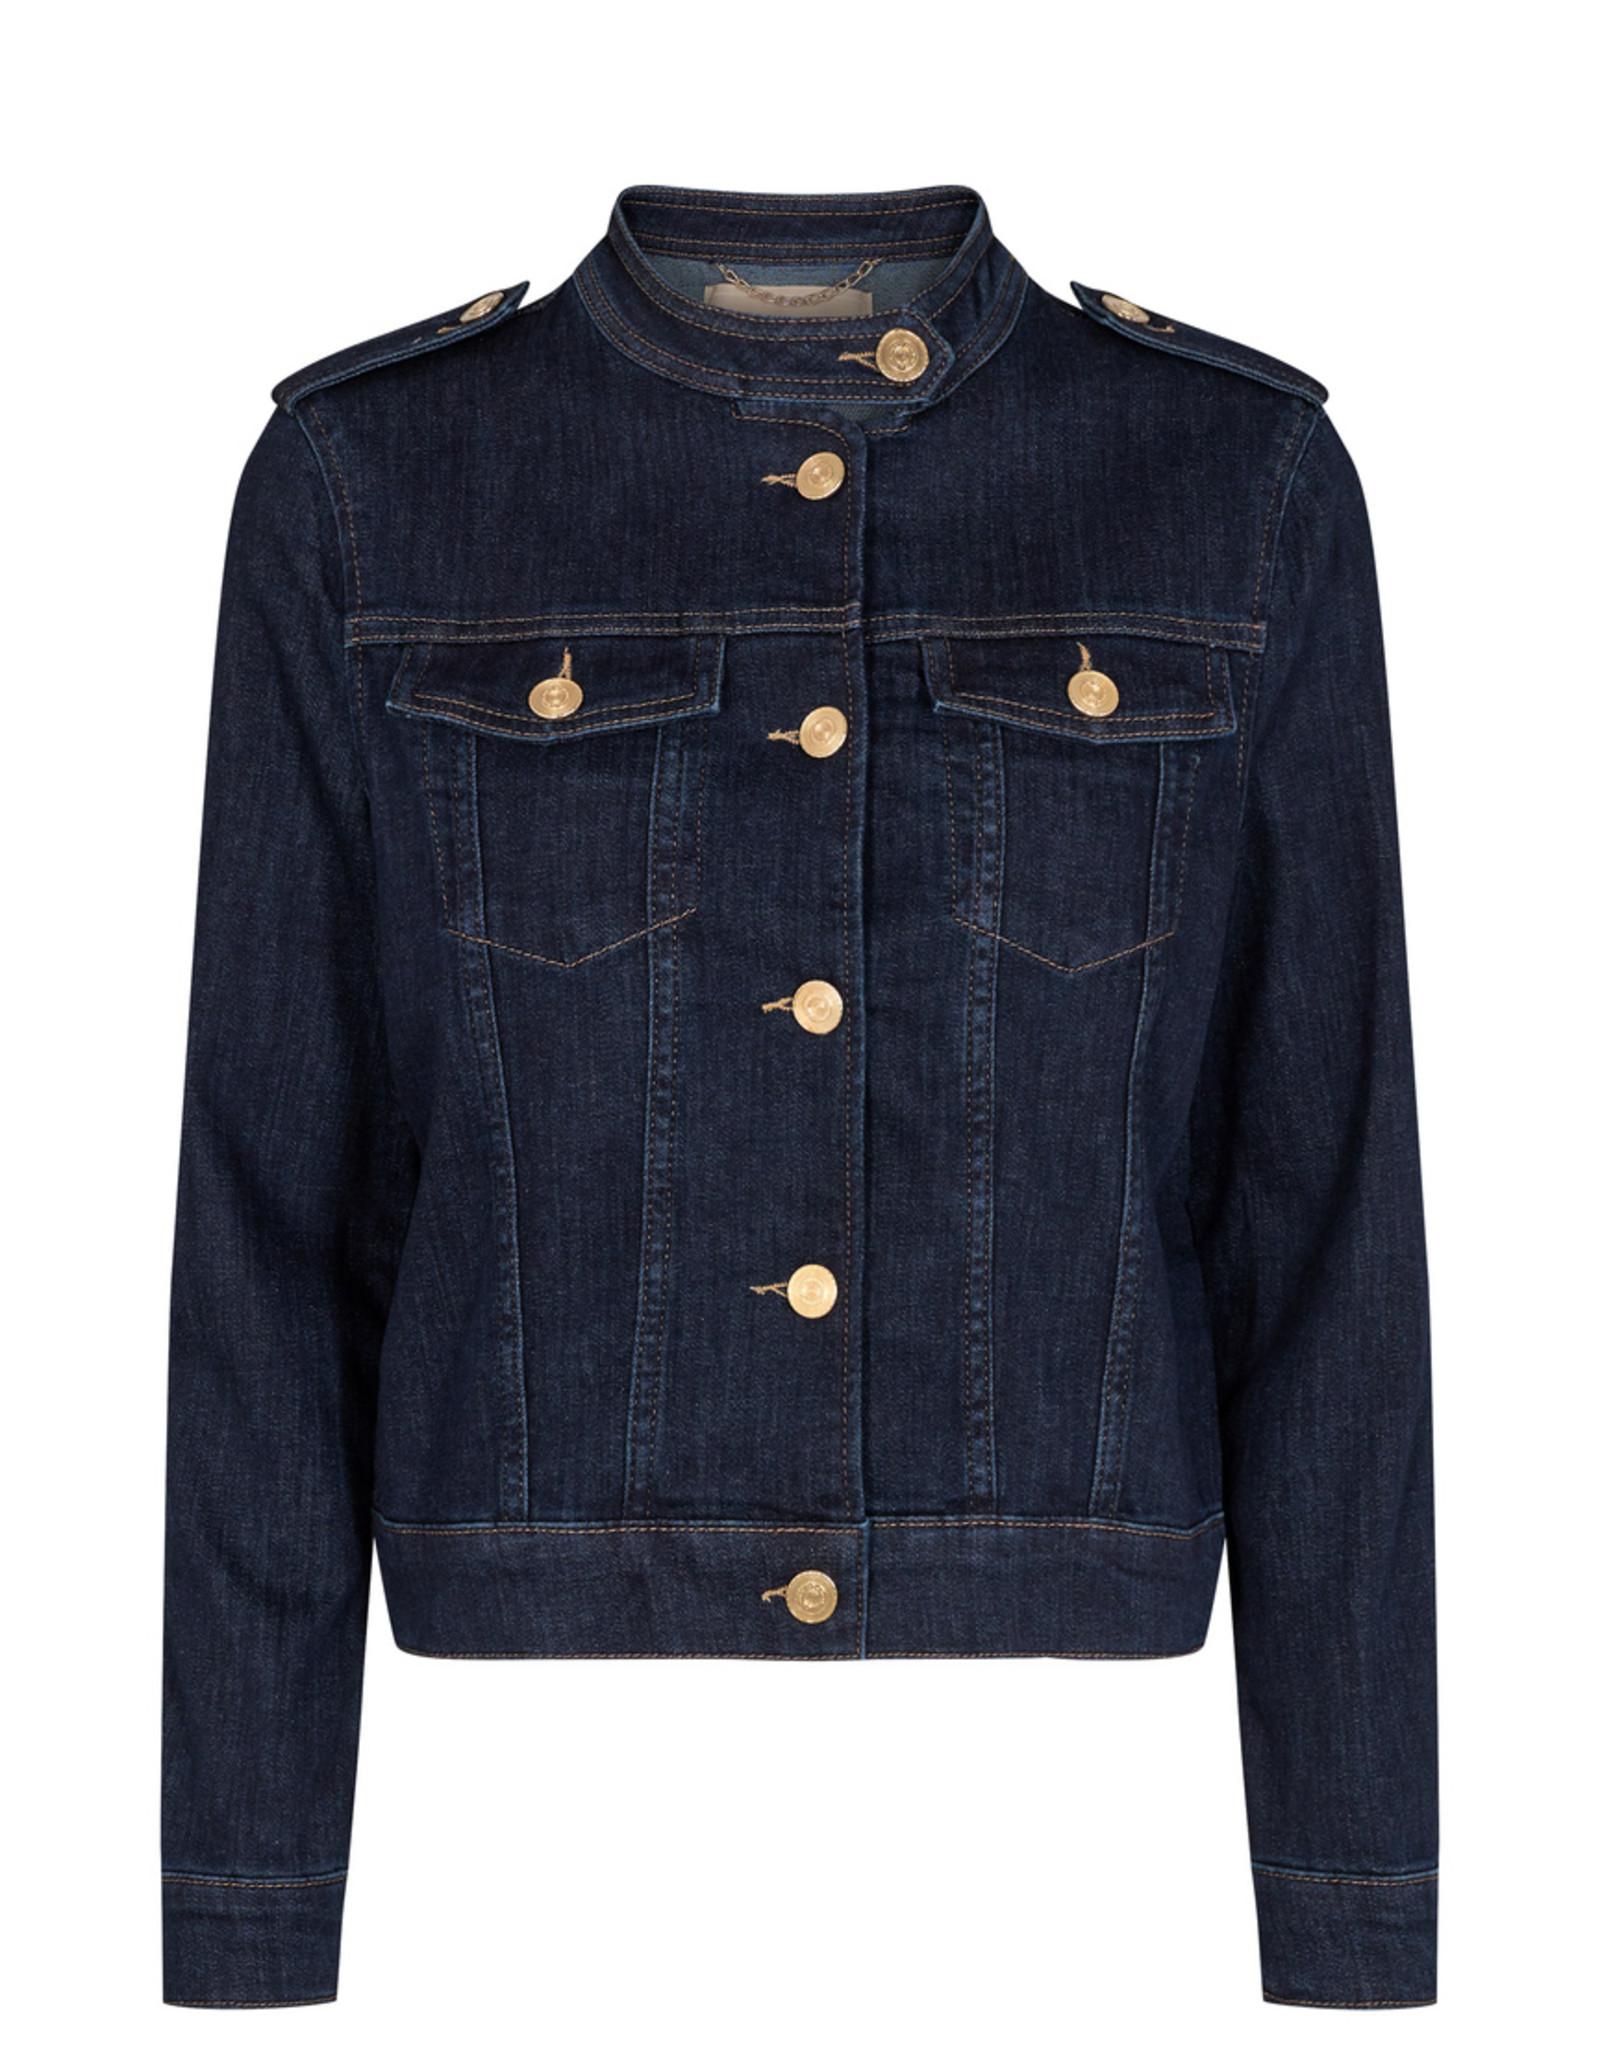 Mos Mosh Raven Denim Jacket - 140910